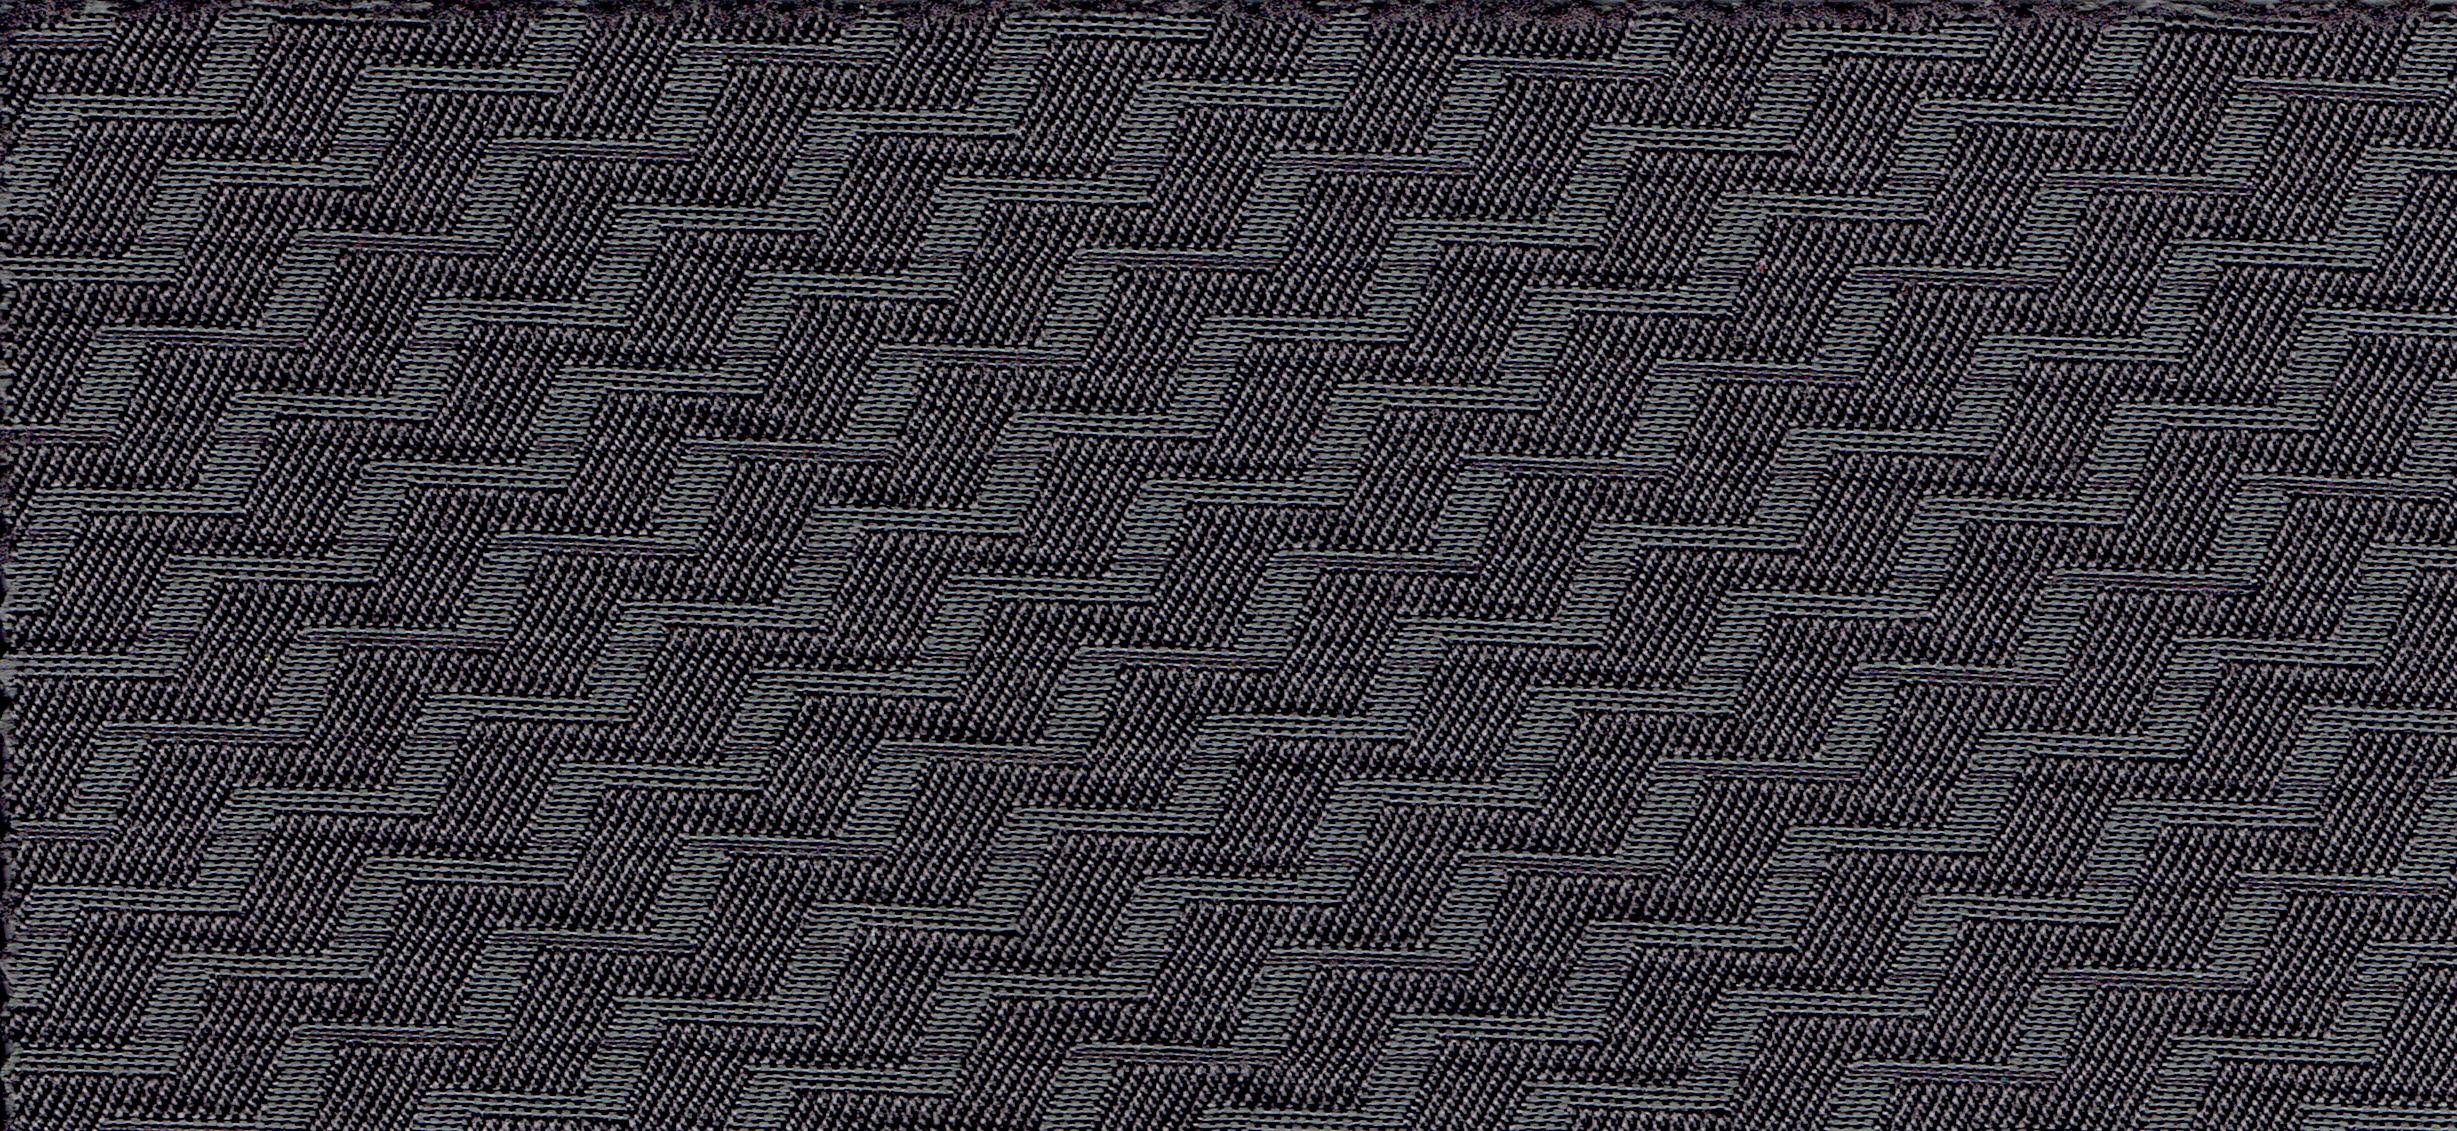 fabric26082015_0001.jpg